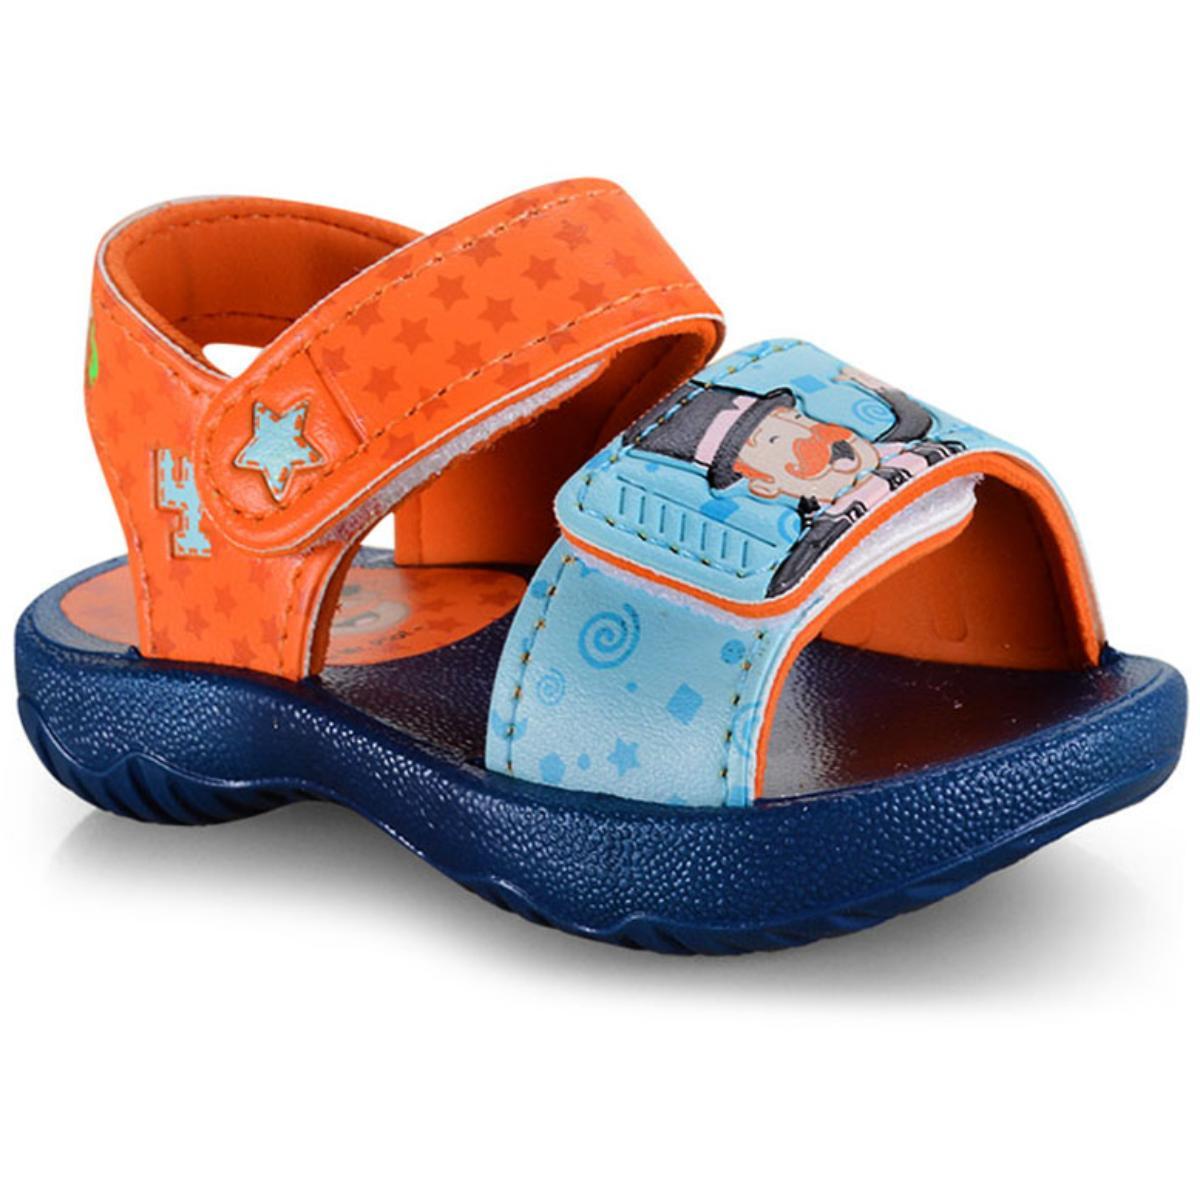 Sandália Masc Infantil Grendene 22173 24803 Bita Nosa Turma Sand Azul/laranja